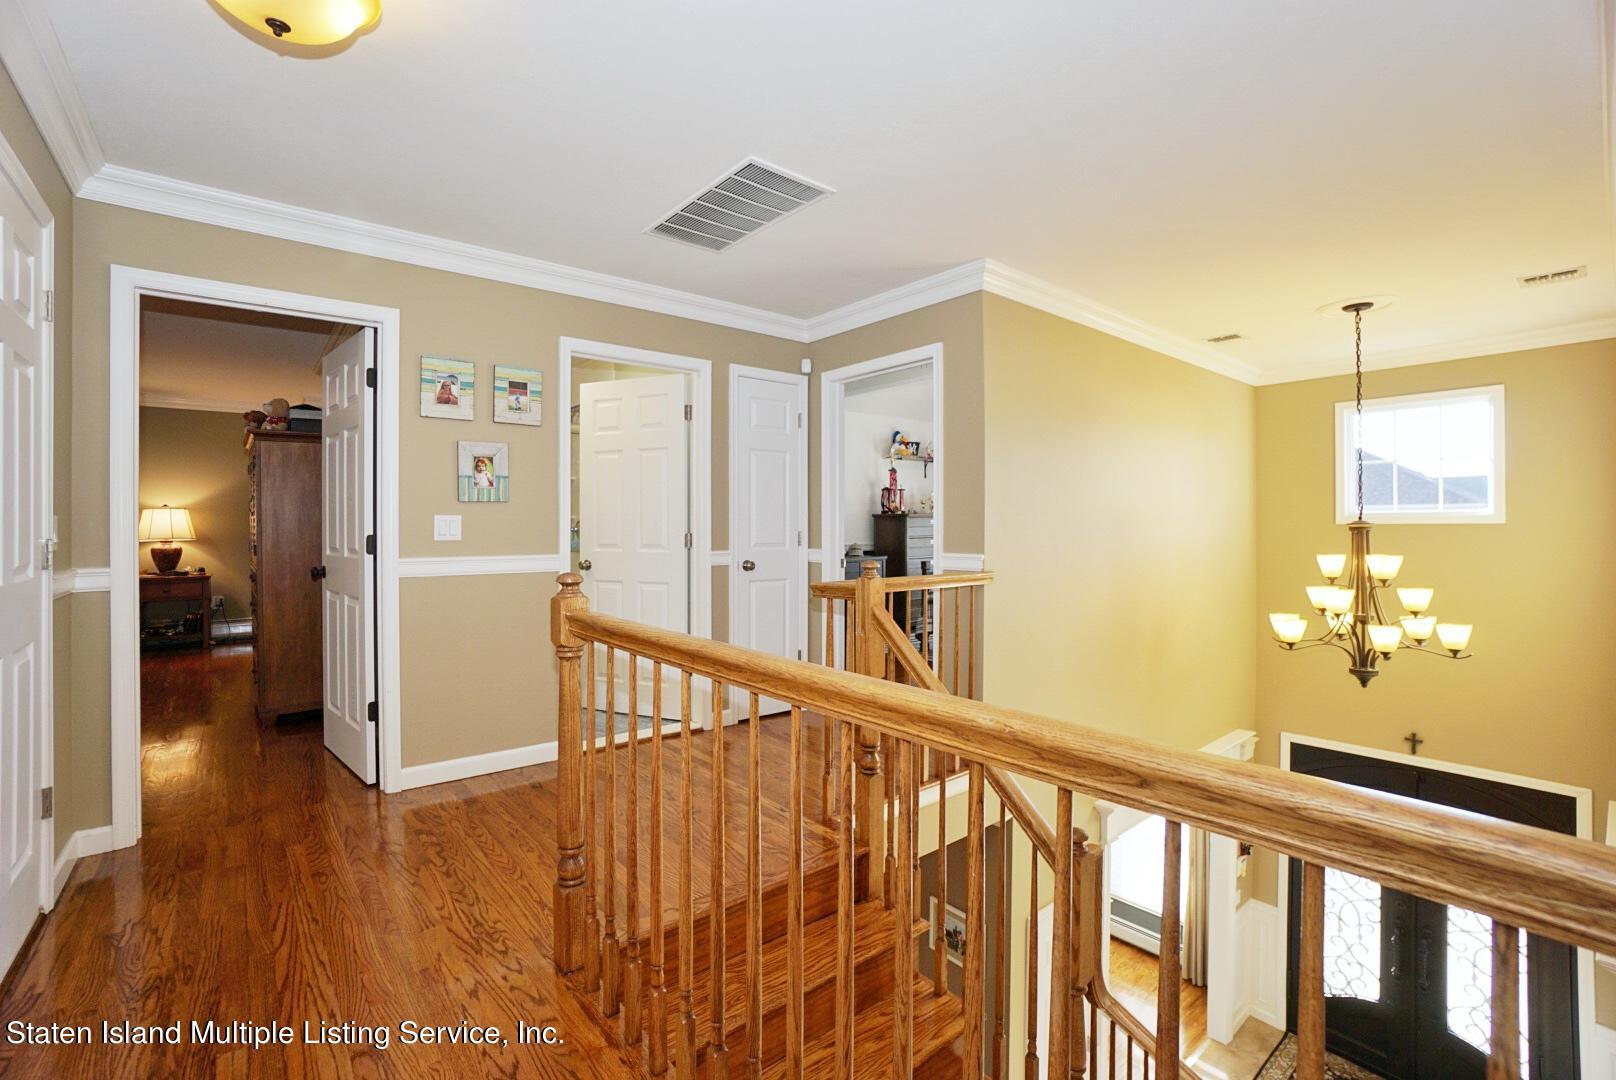 Single Family - Detached 31 Belwood Loop  Staten Island, NY 10307, MLS-1143133-28